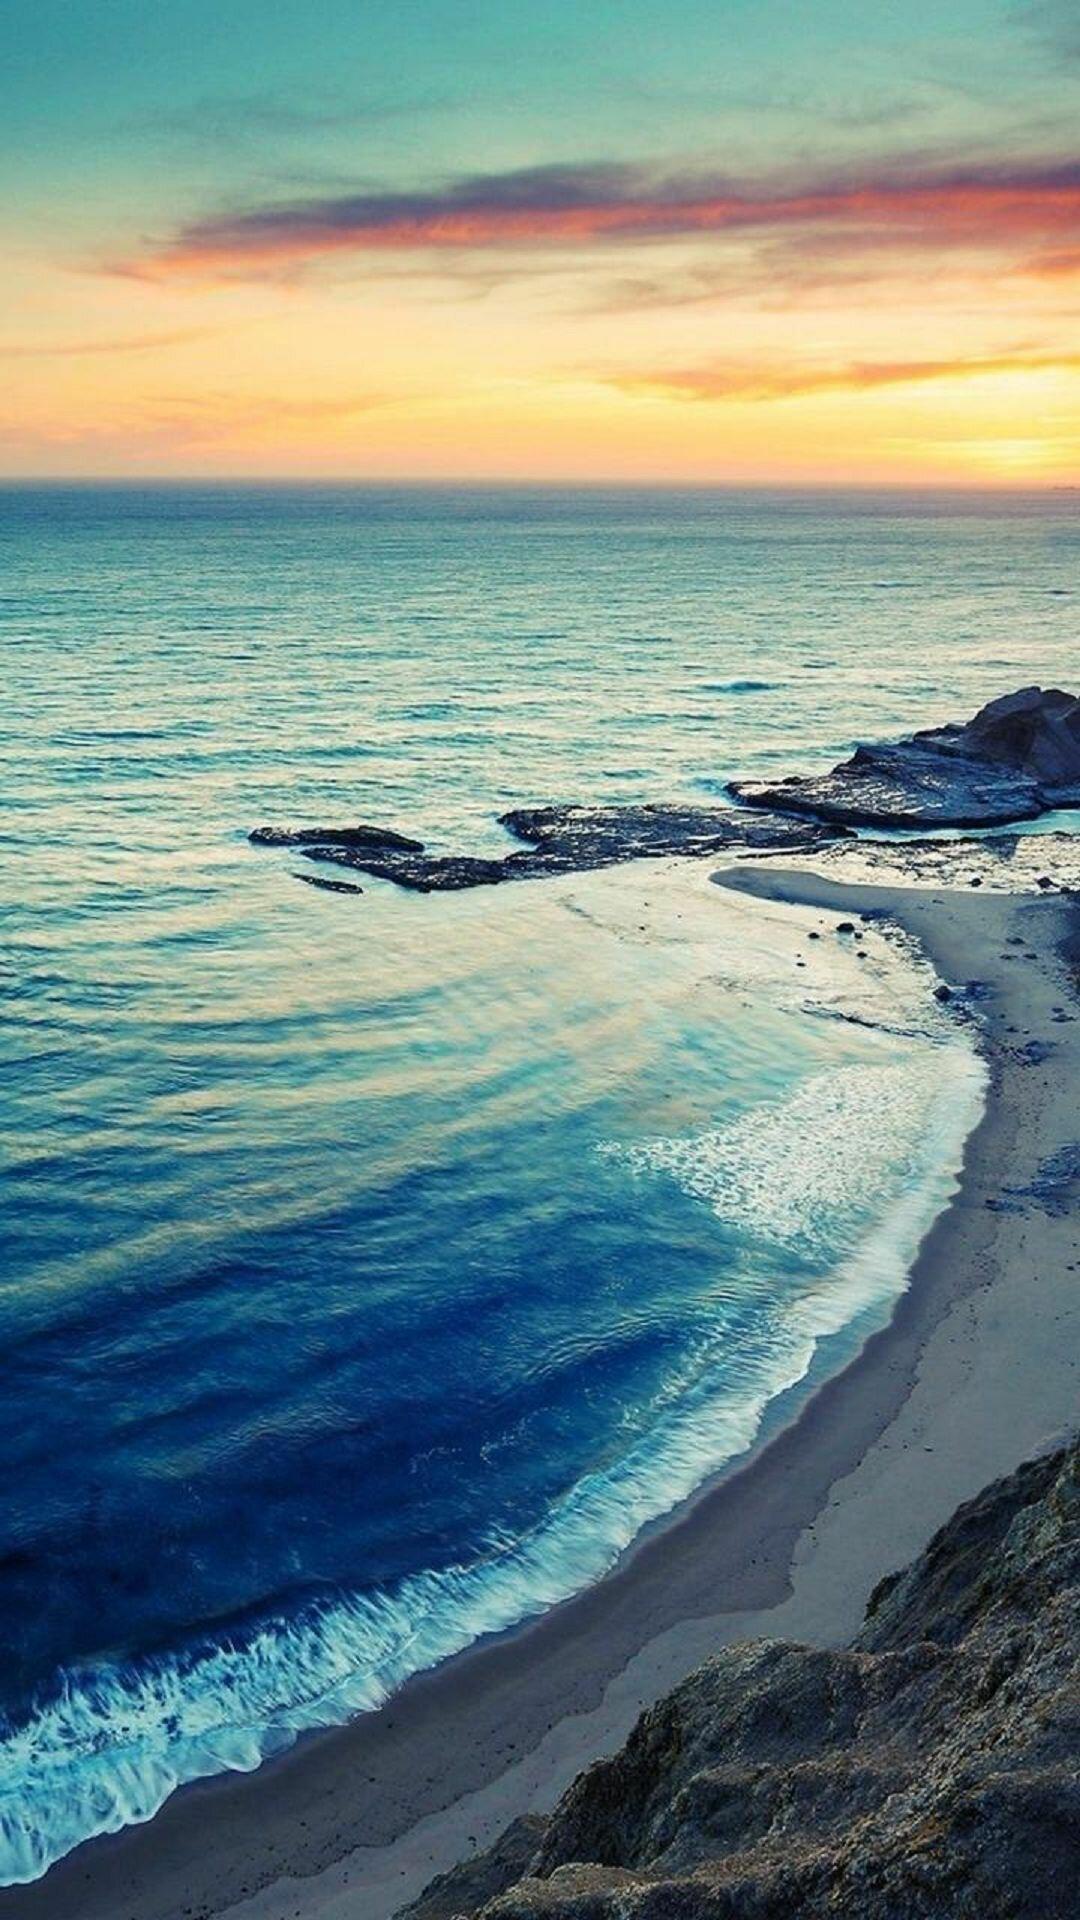 фото аллей моря для телефона часто